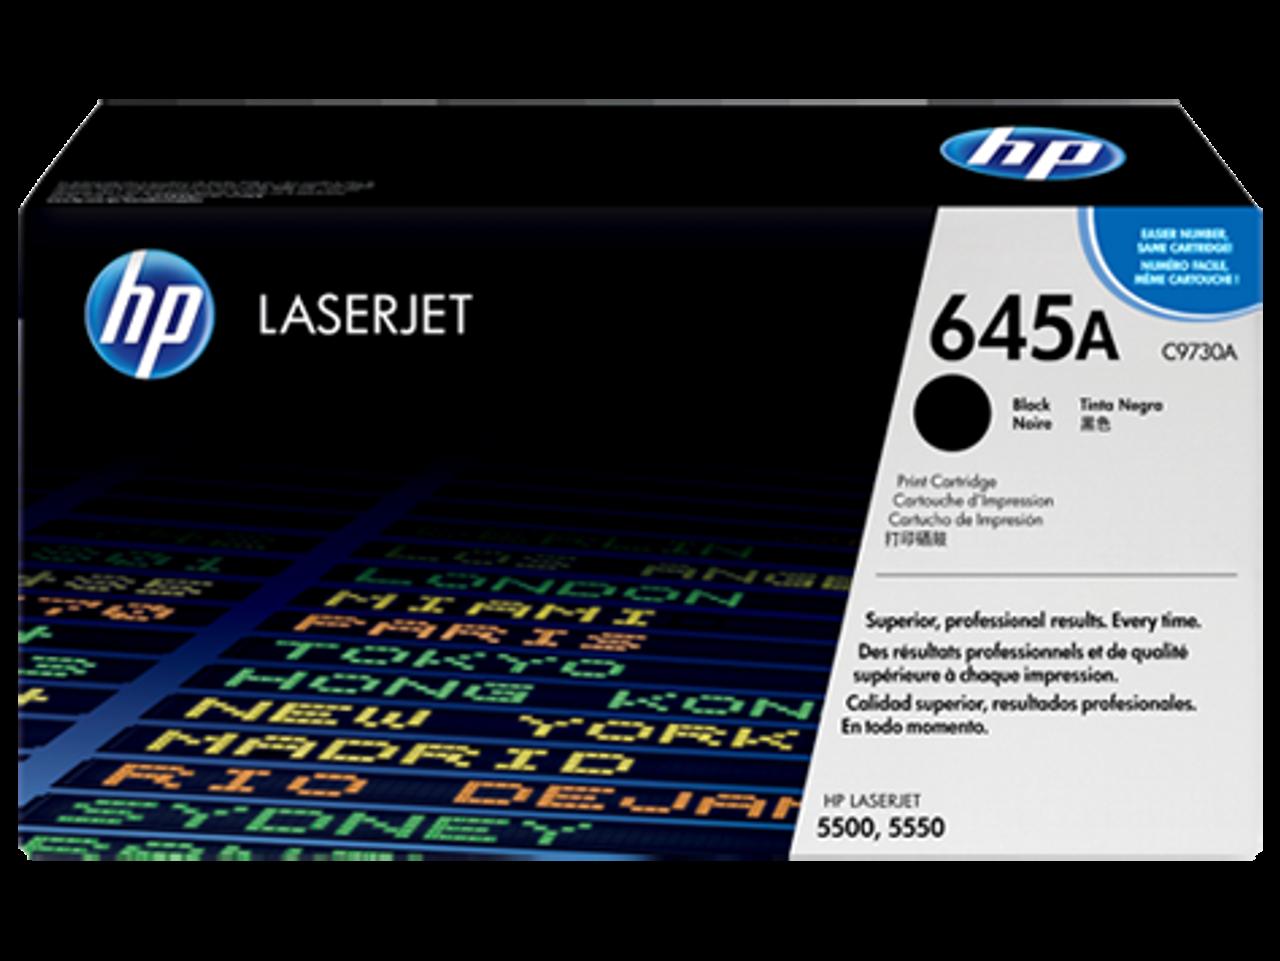 HP 5500 5550 Black Toner Cartridge - New